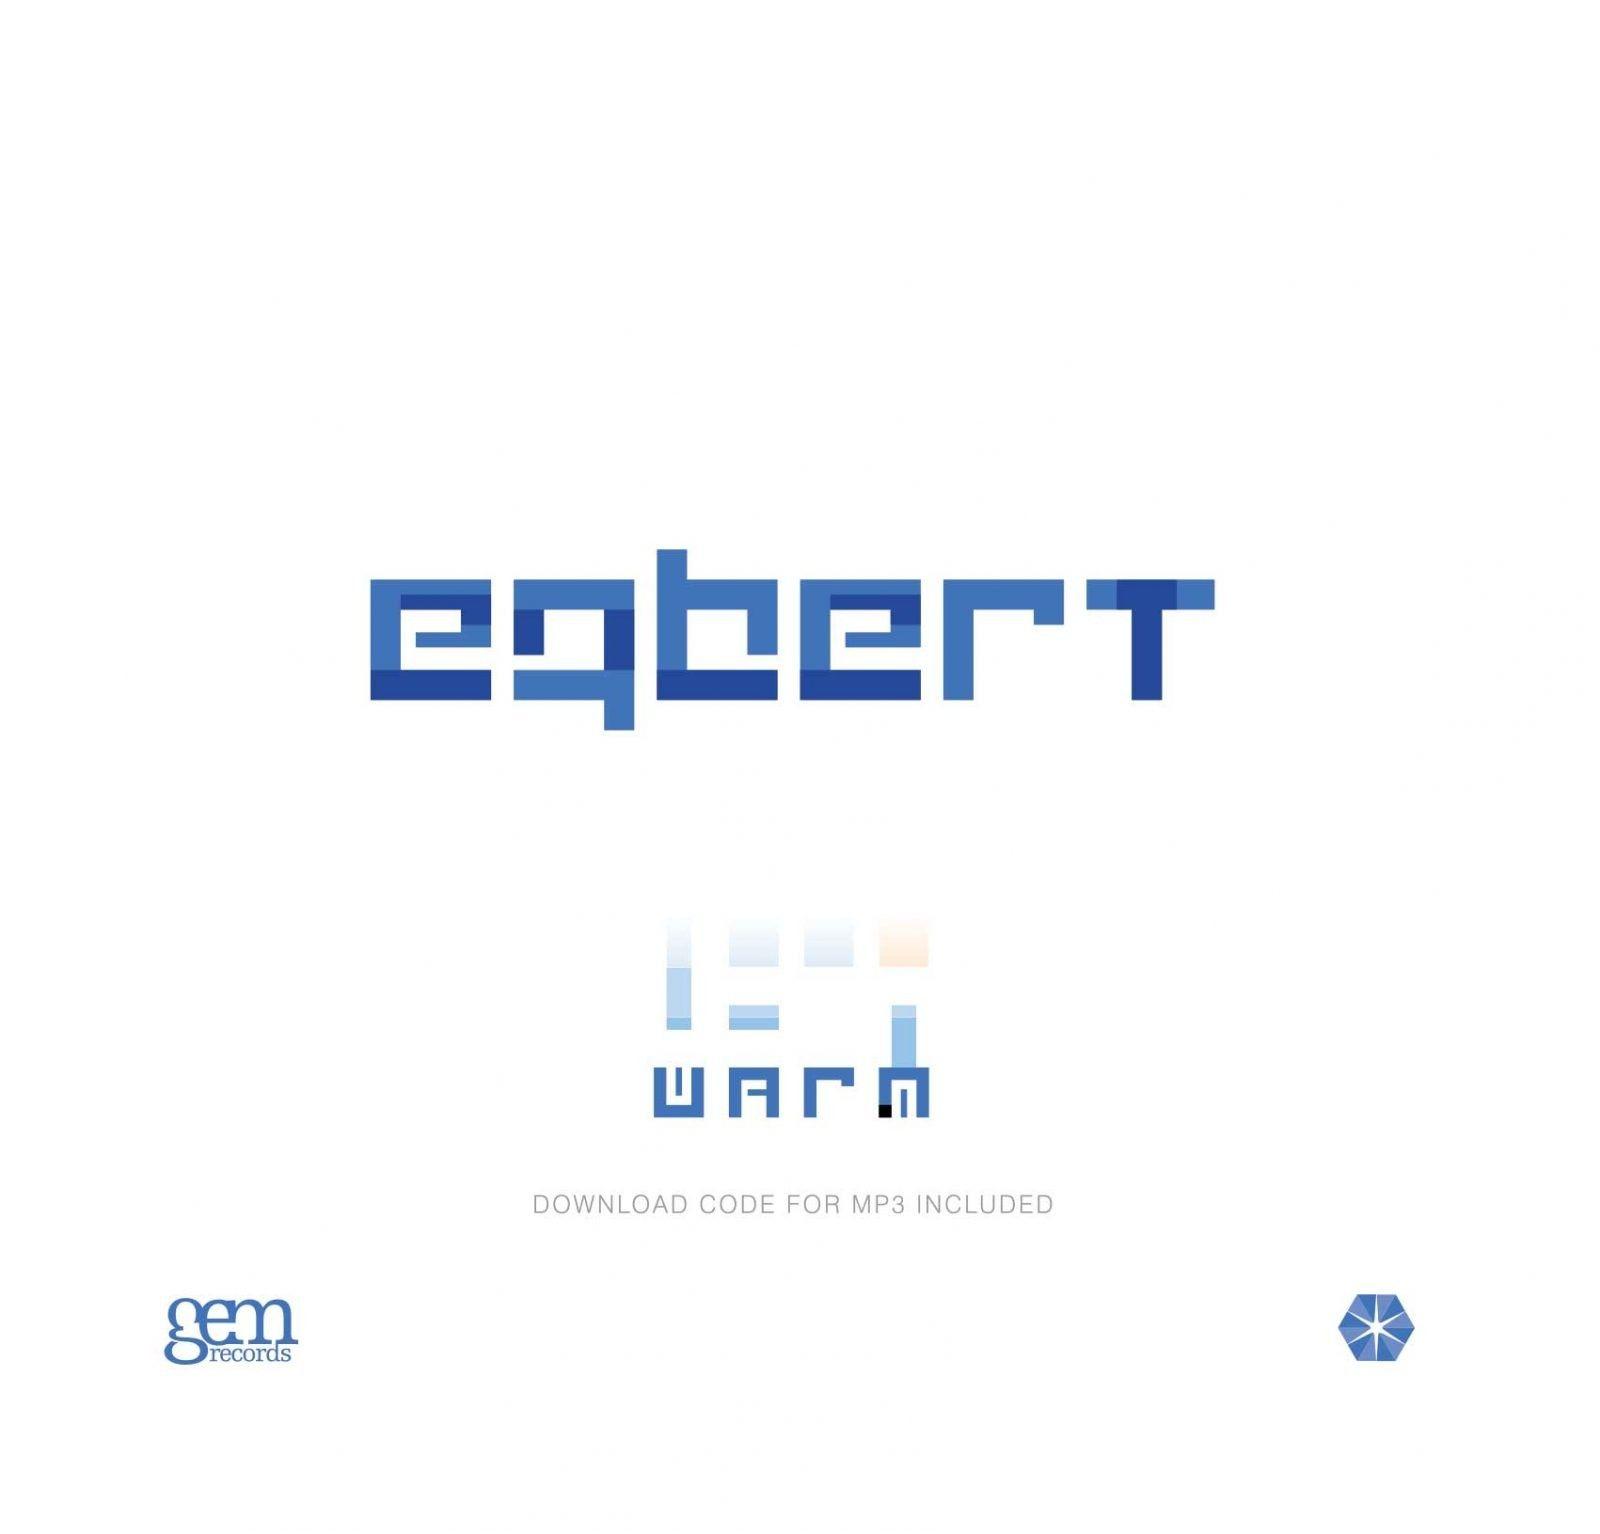 egbert-warm-web-square.jpg.jpeg